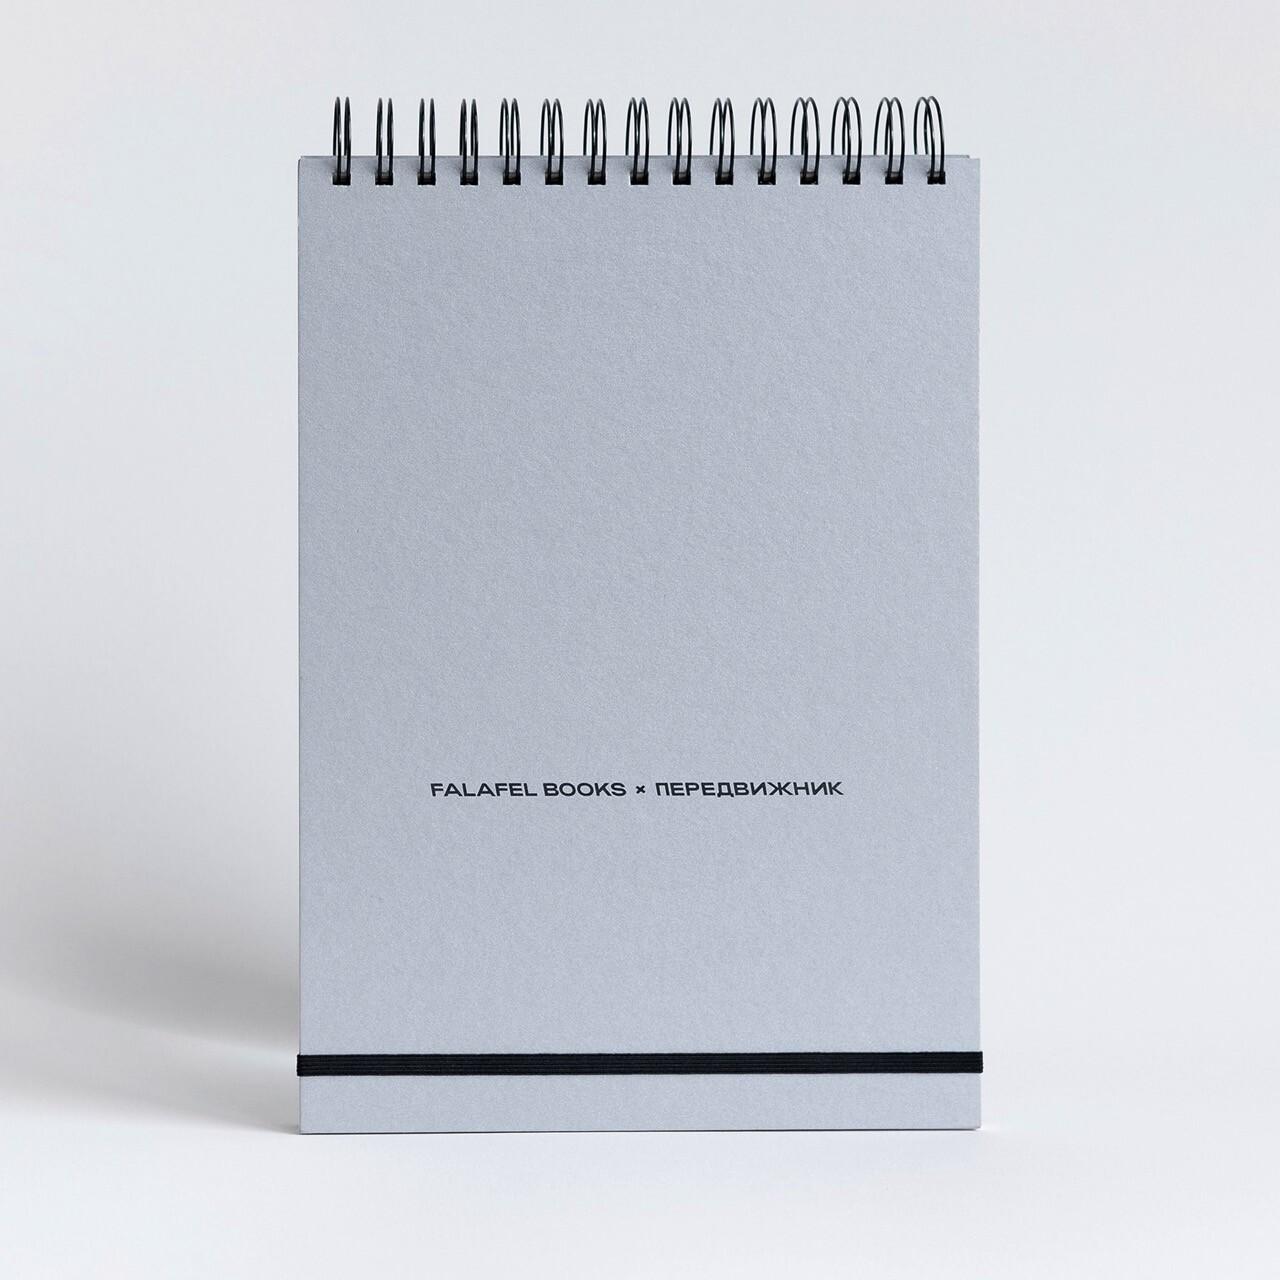 Скетчбук Falafel books × Передвижник A4